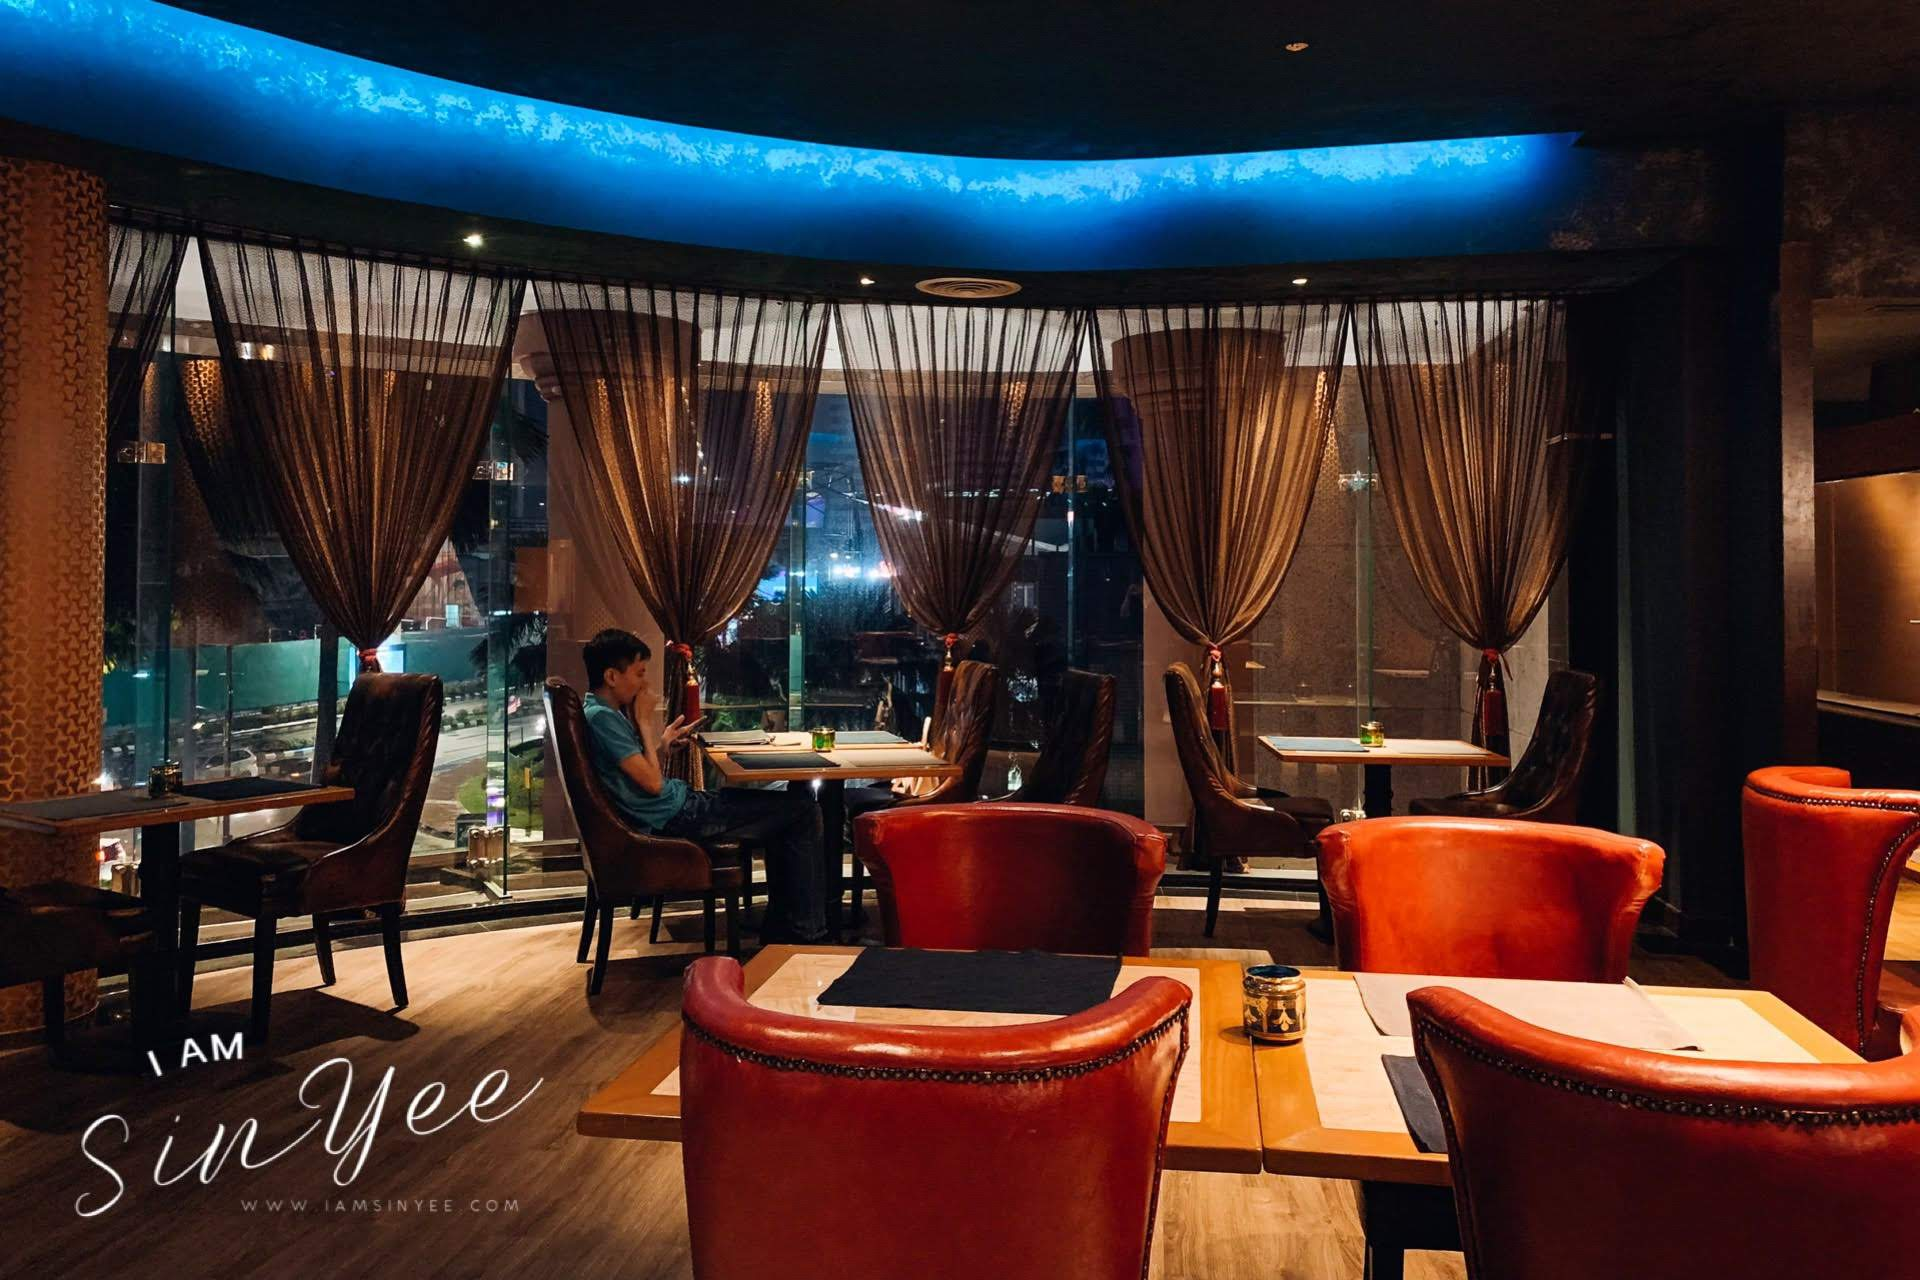 The Sultanate Restaurant Renaissance Hotel